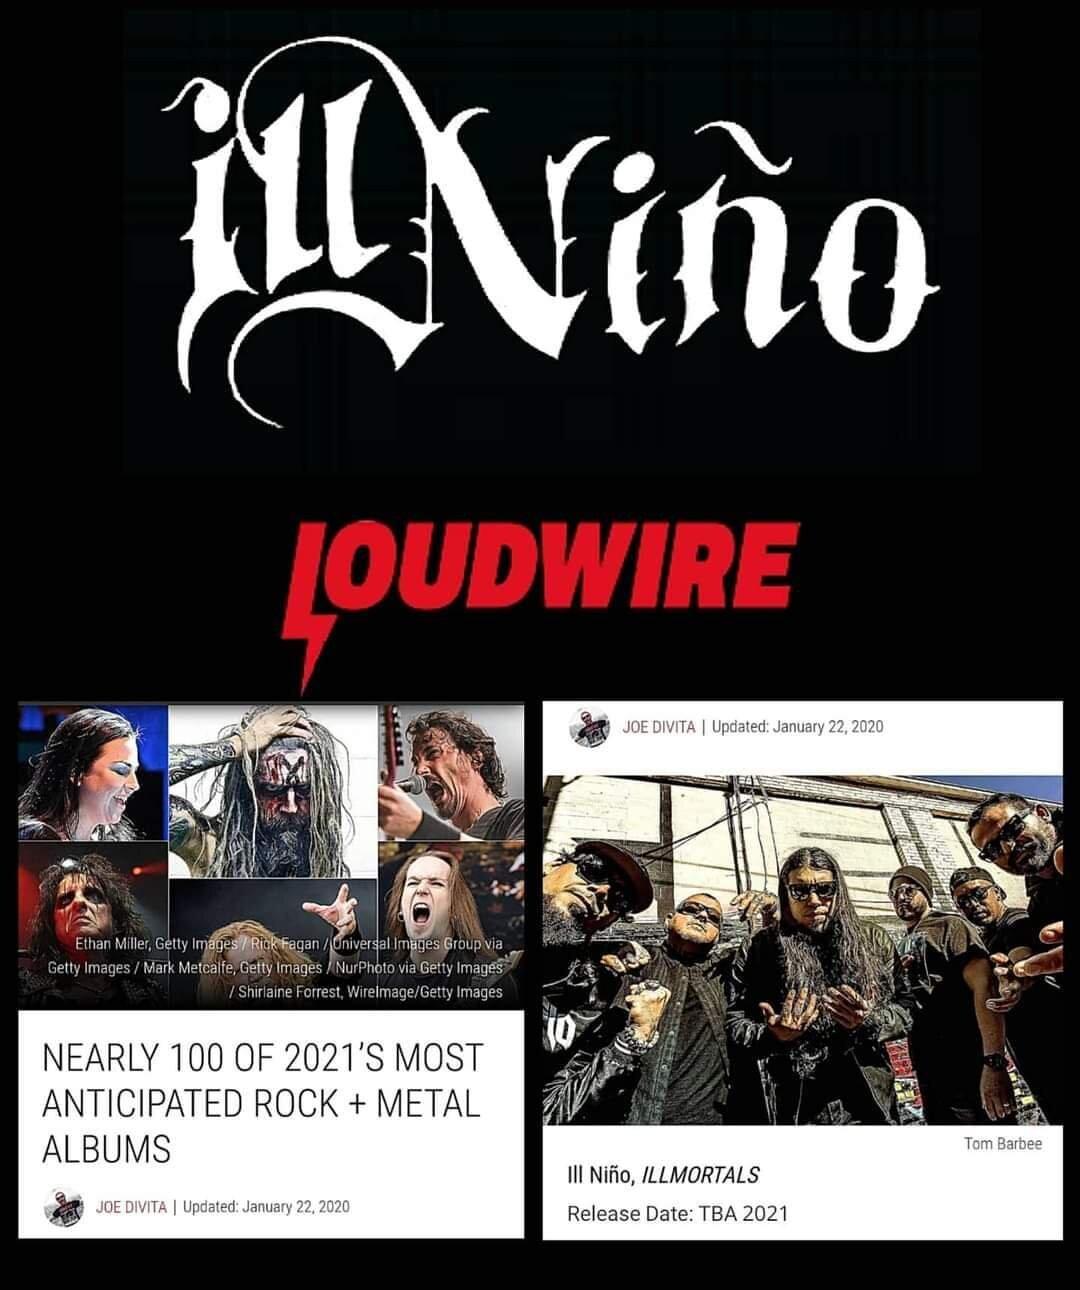 A8juiv2t Tvw1m Find ill nino pictures and ill nino photos on desktop nexus. https www illnino1 com